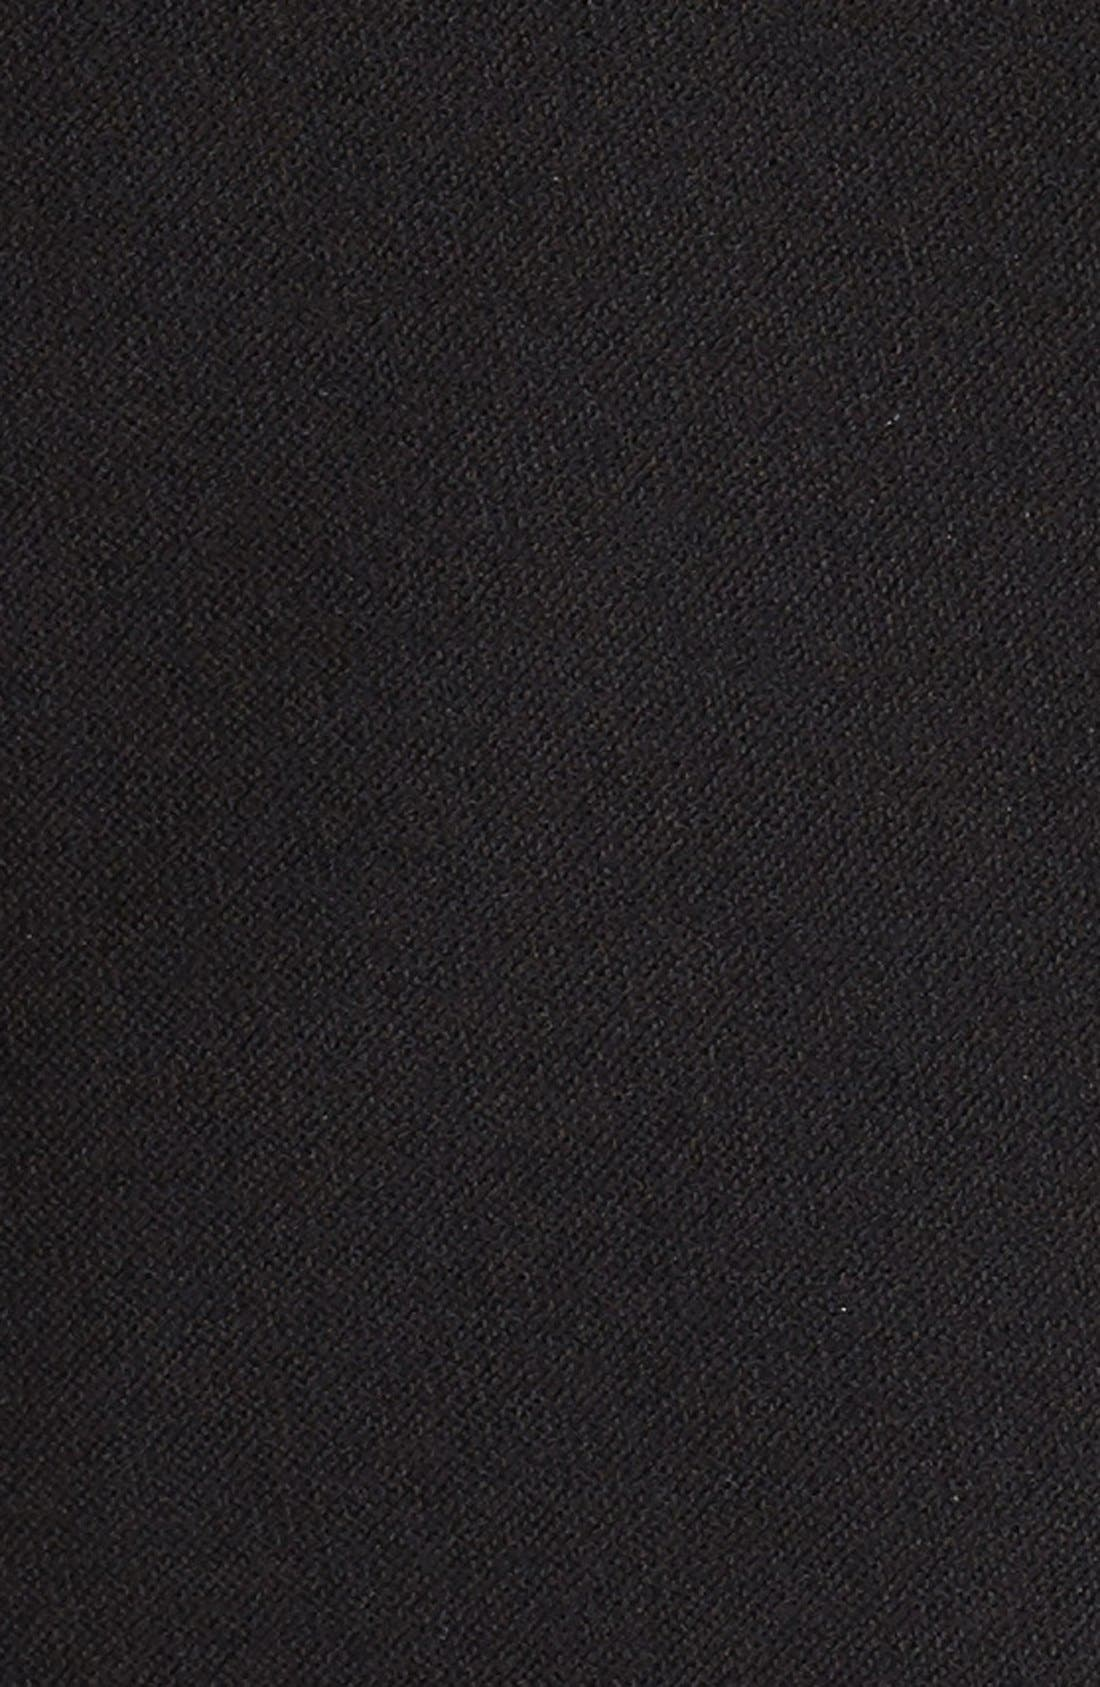 Washable Stretch Crepe Jacket,                             Alternate thumbnail 6, color,                             BLACK